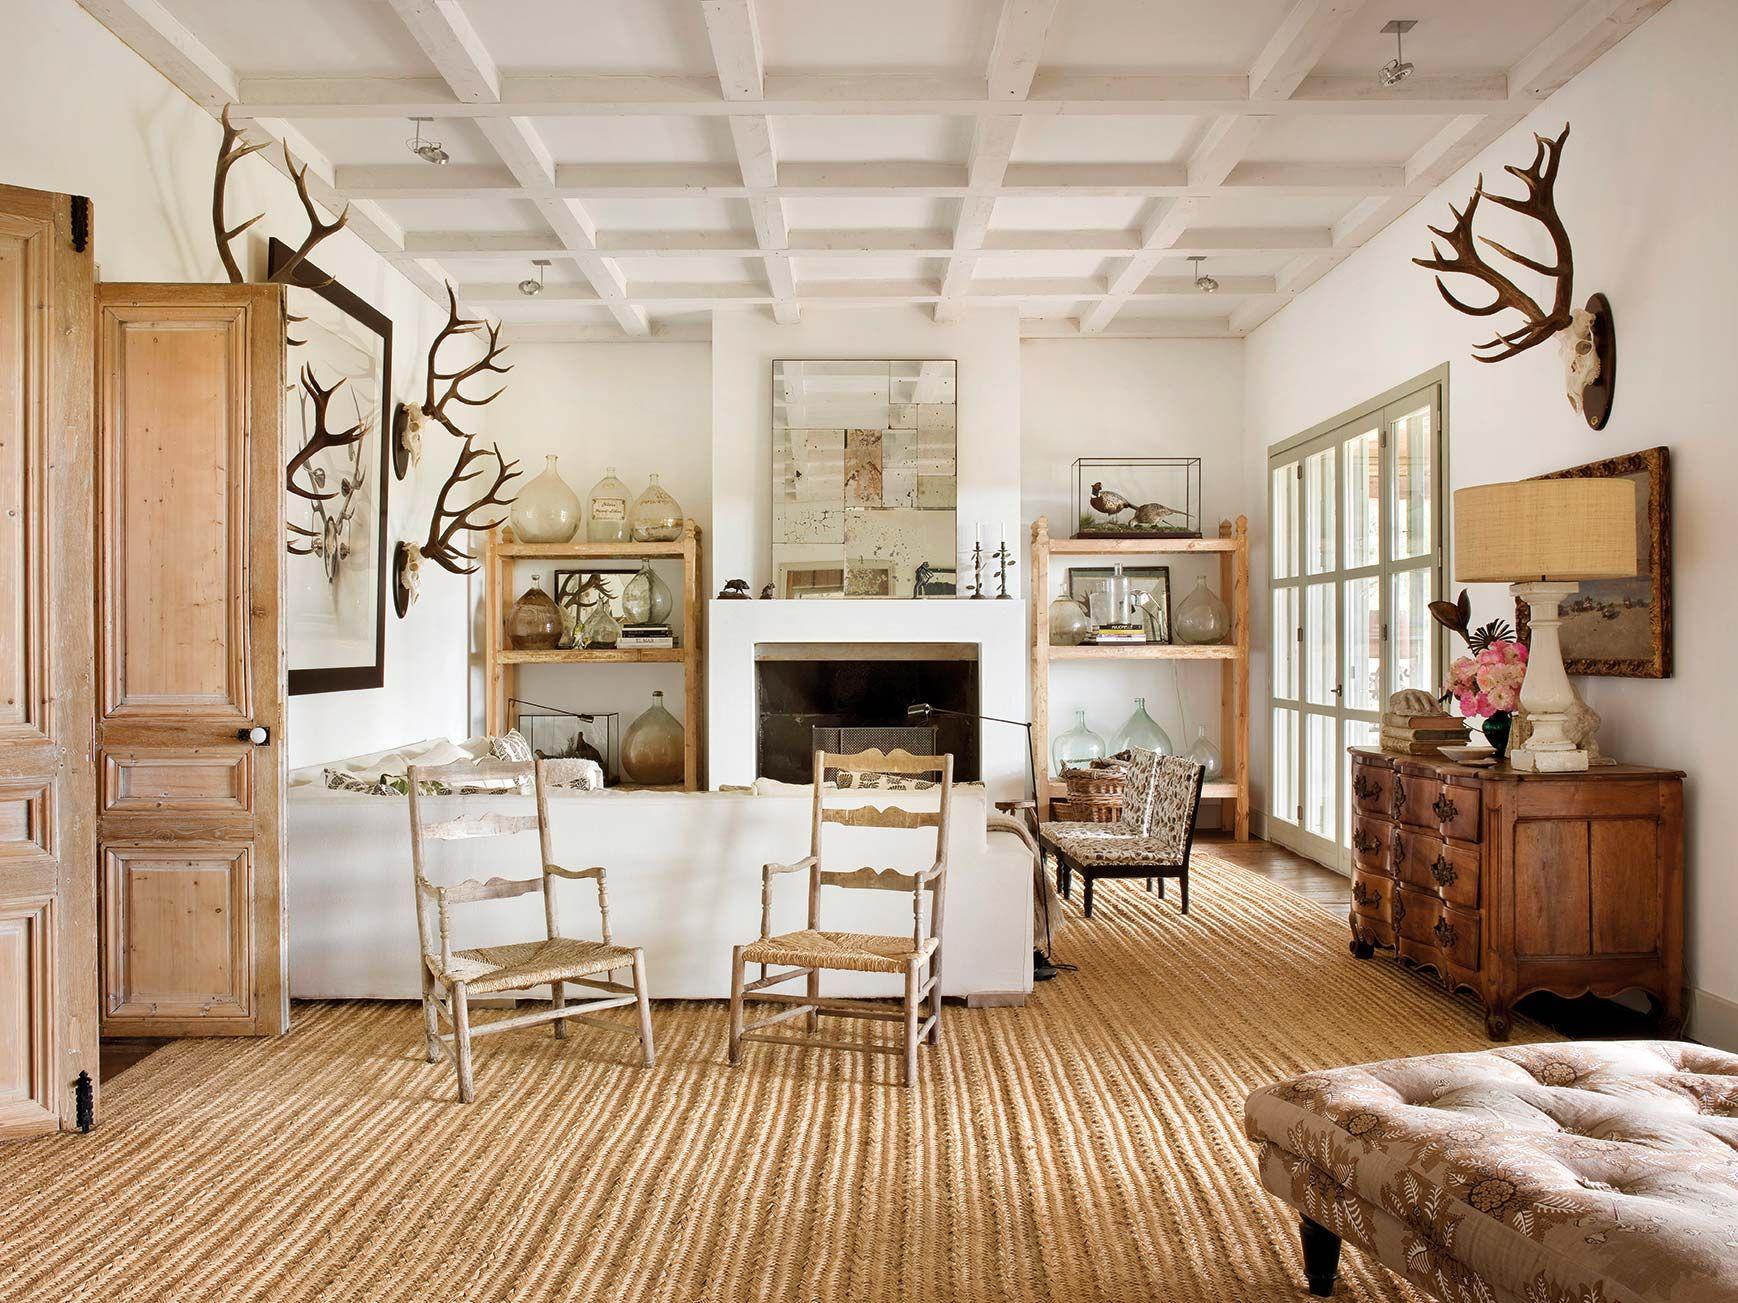 alfombra-yute-1538055090.jpg